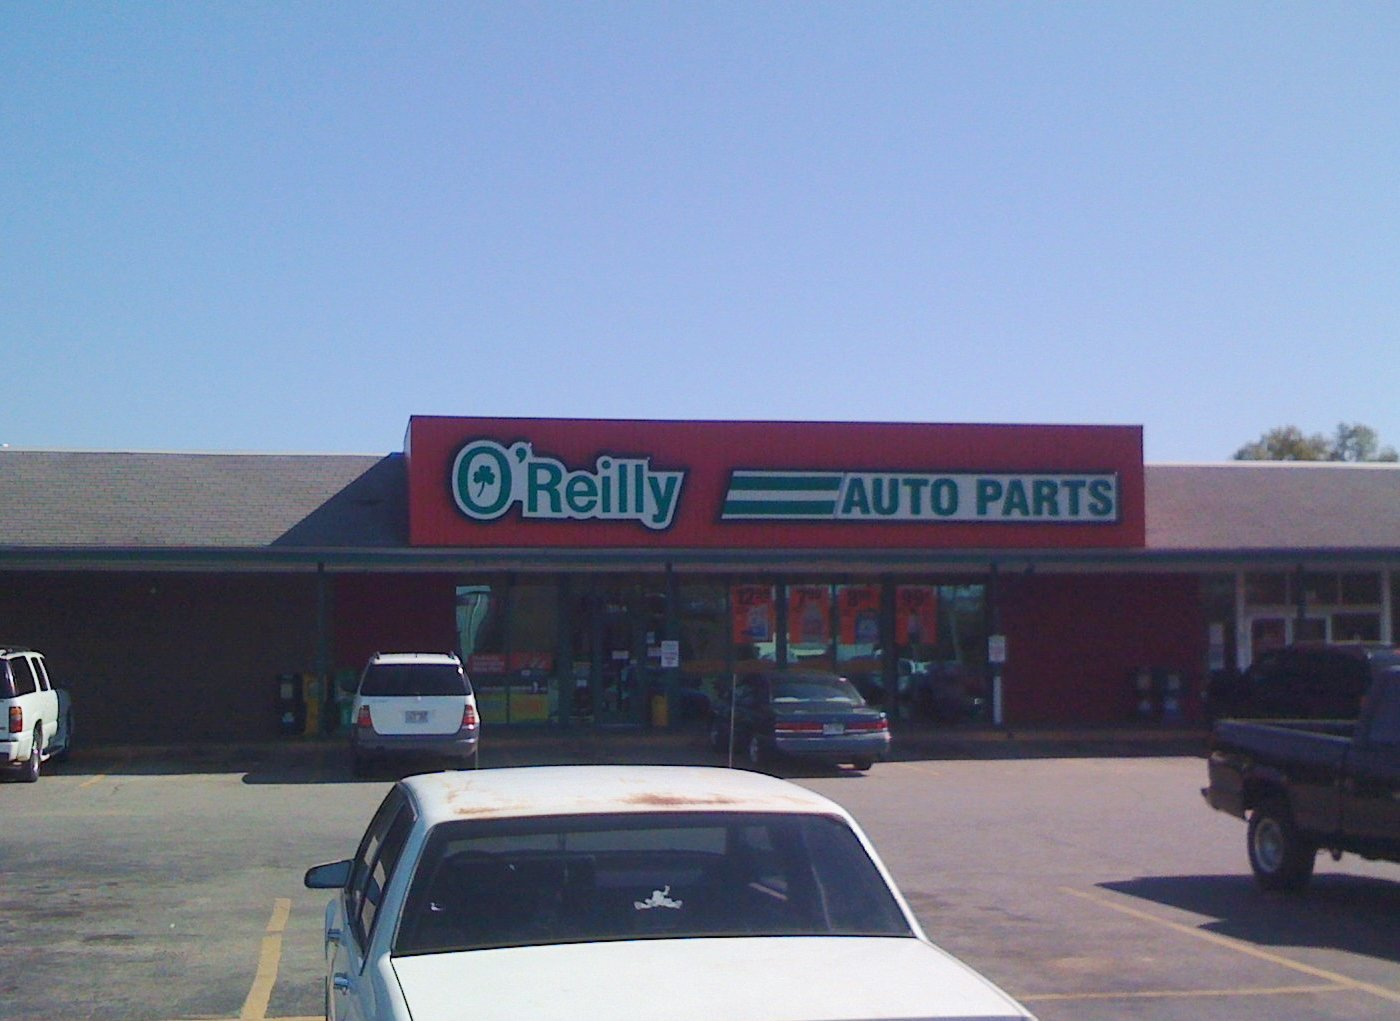 o'reilly auto parts - photo #16